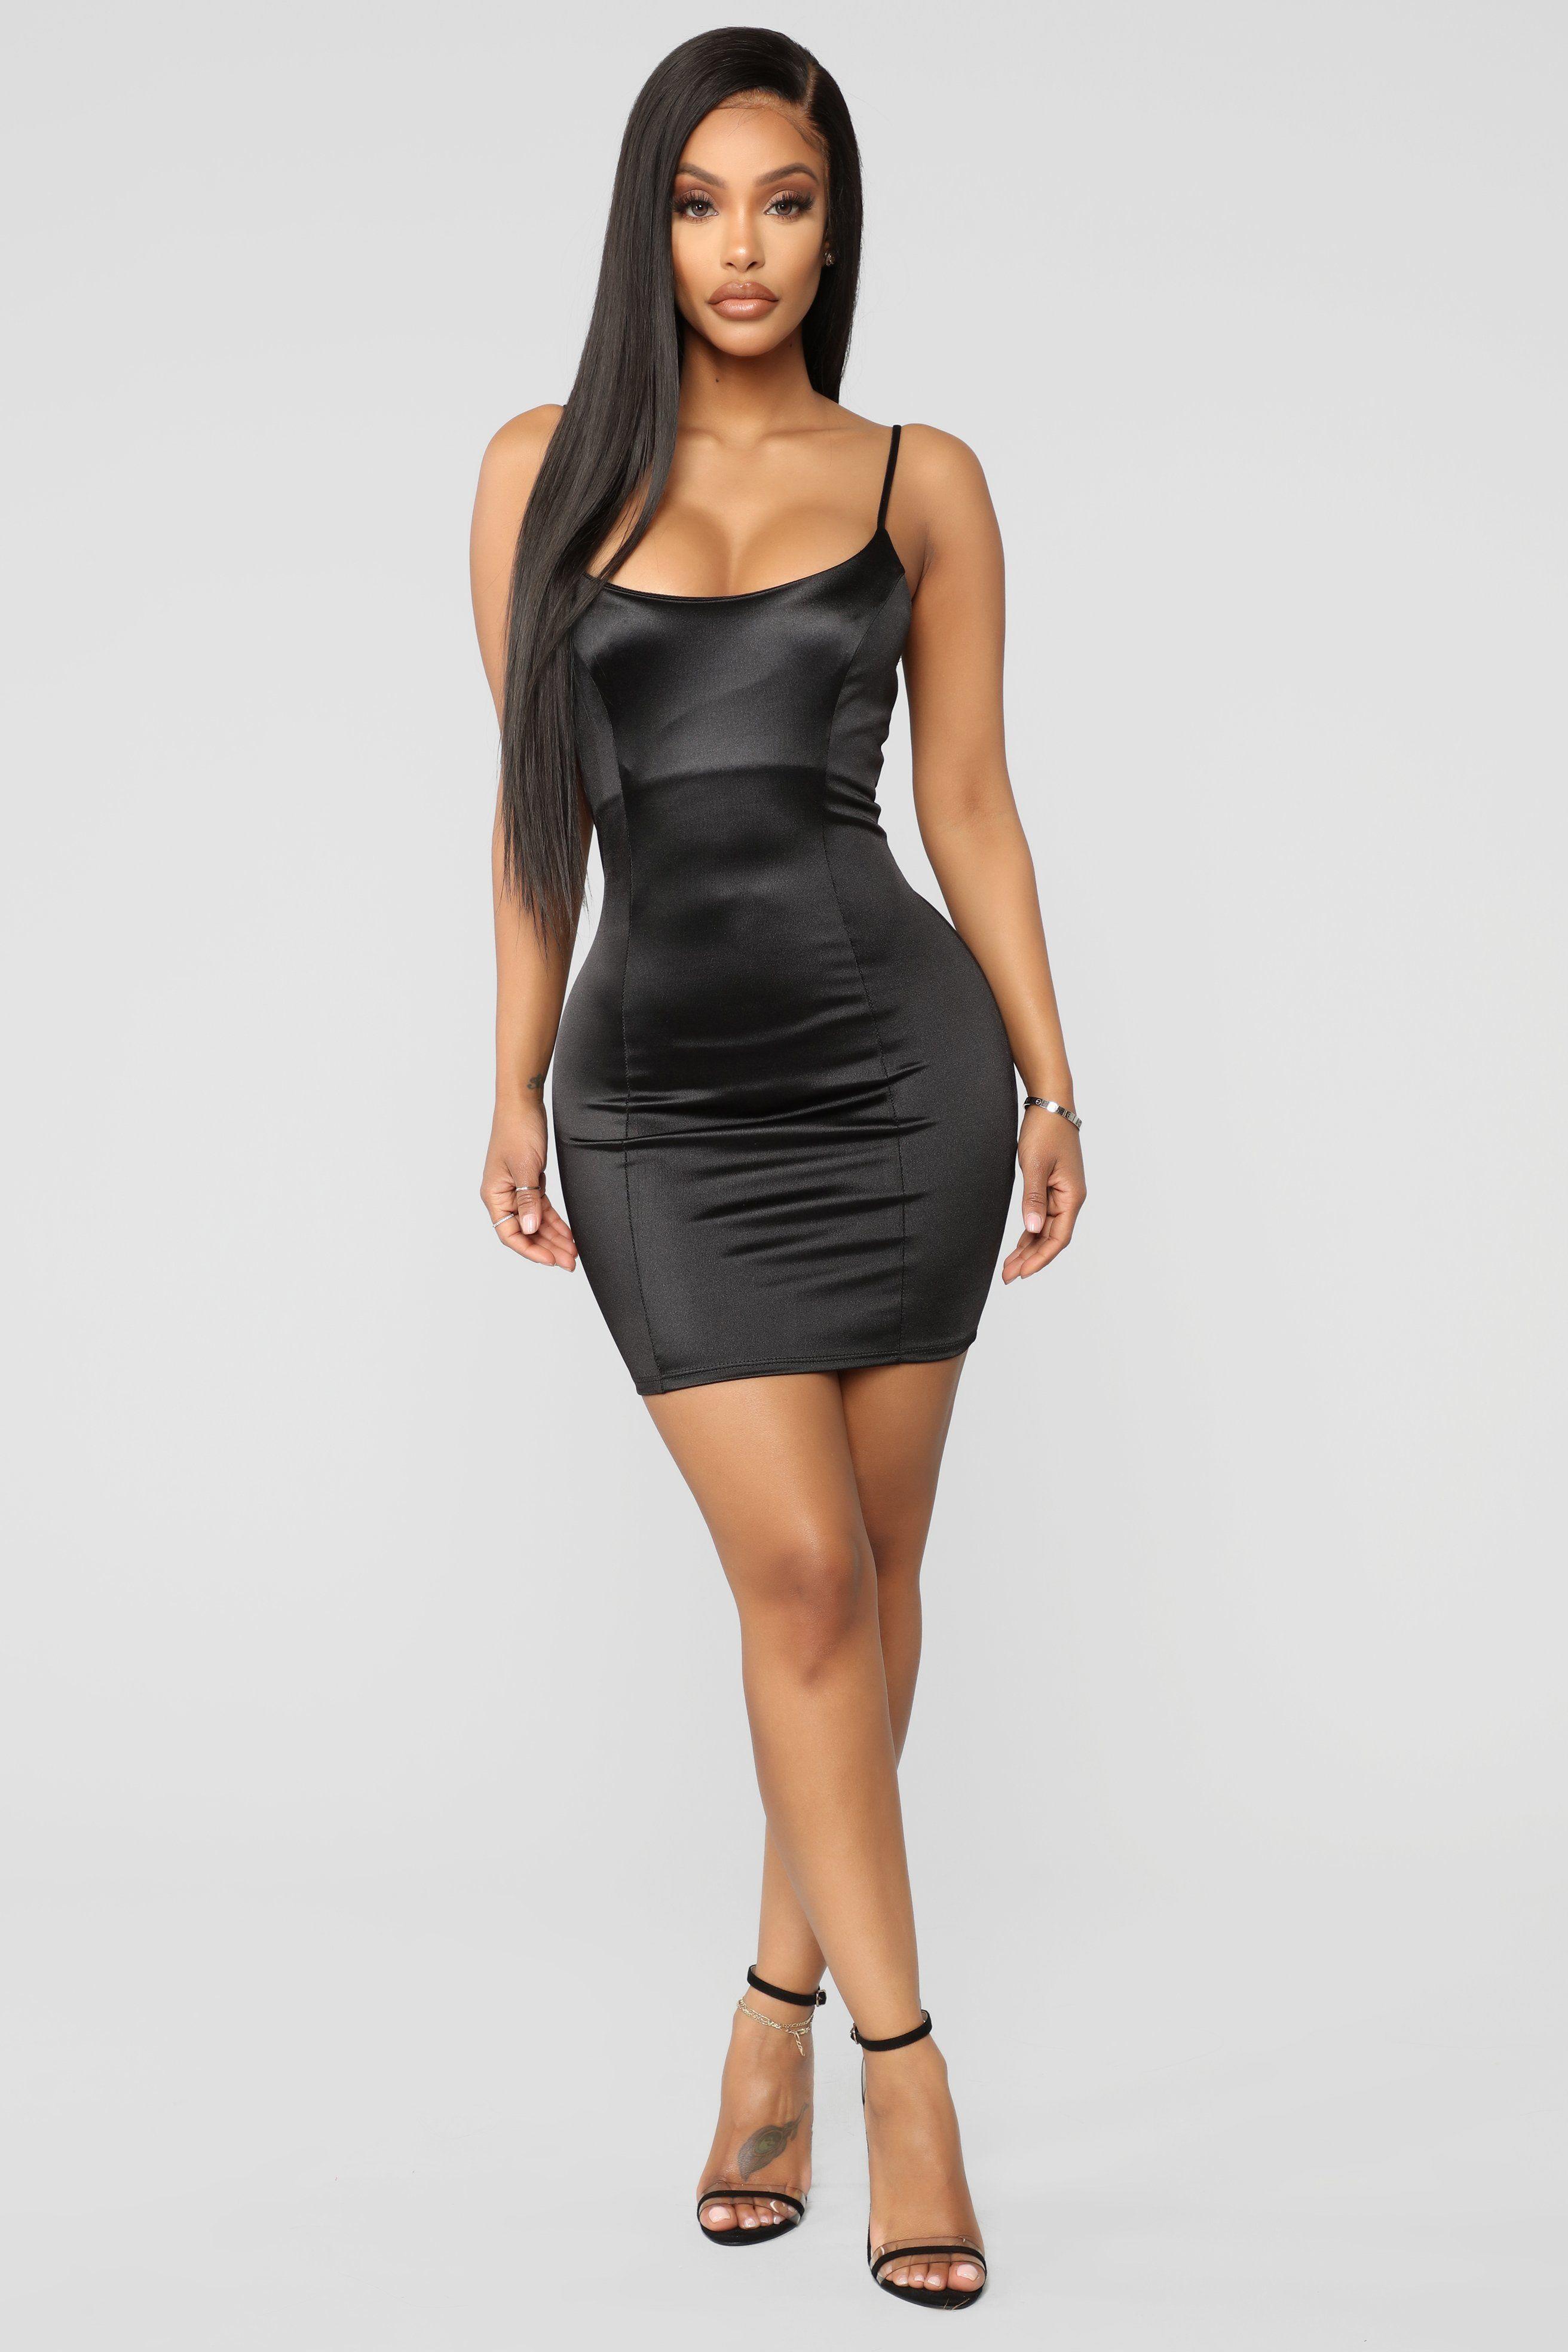 So Smooth Satin Mini Dress Black Mini Black Dress Mini Dress Black Satin Dress [ 3936 x 2624 Pixel ]